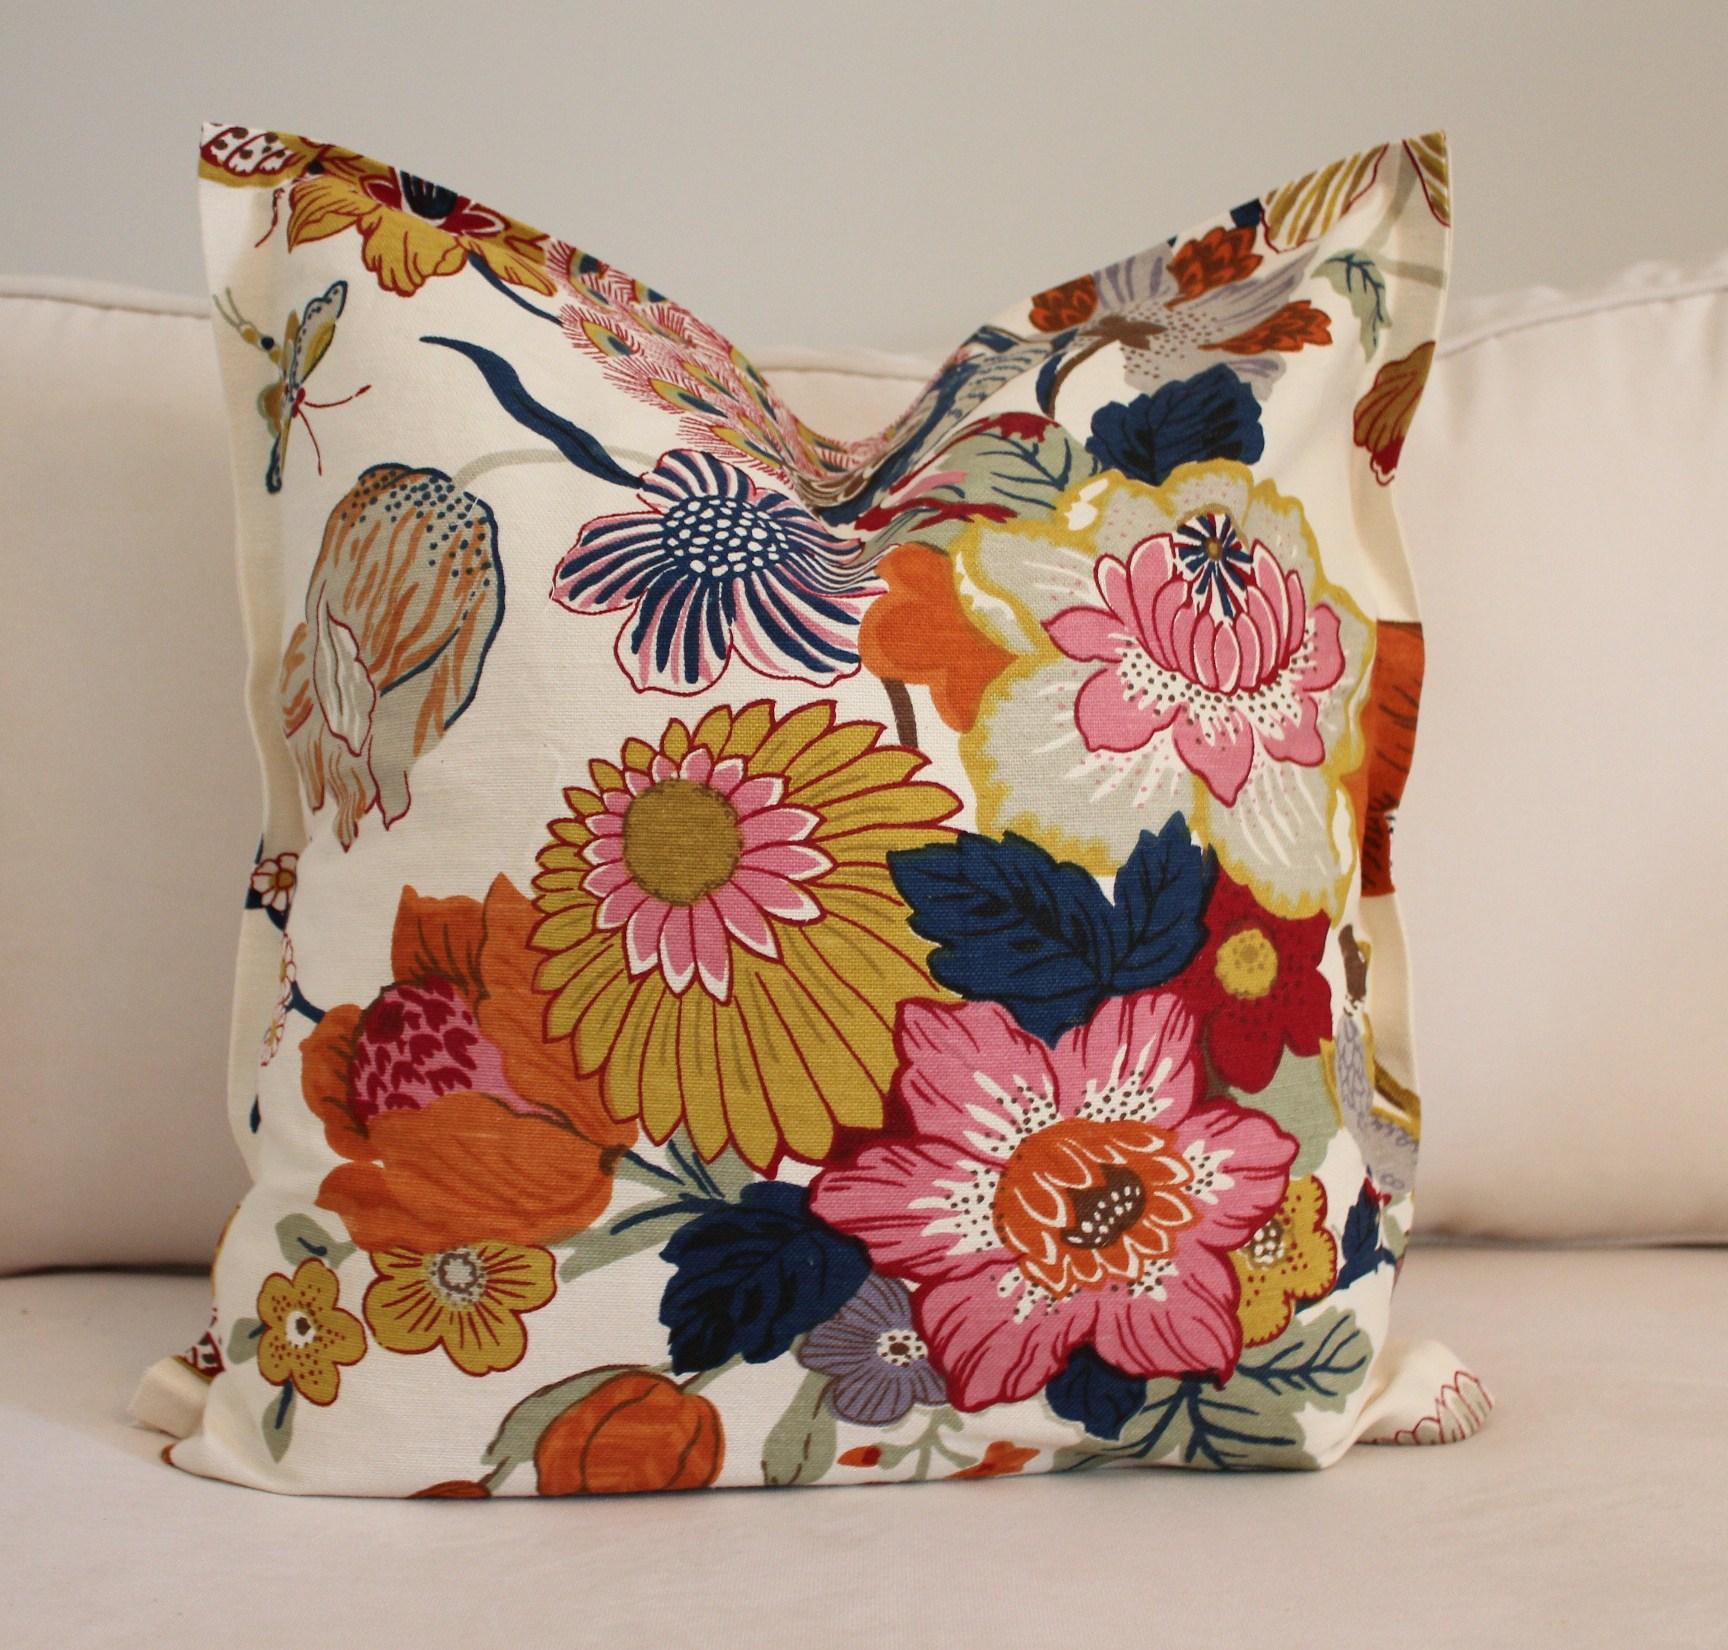 Diy No Sew Pillow 346 Living